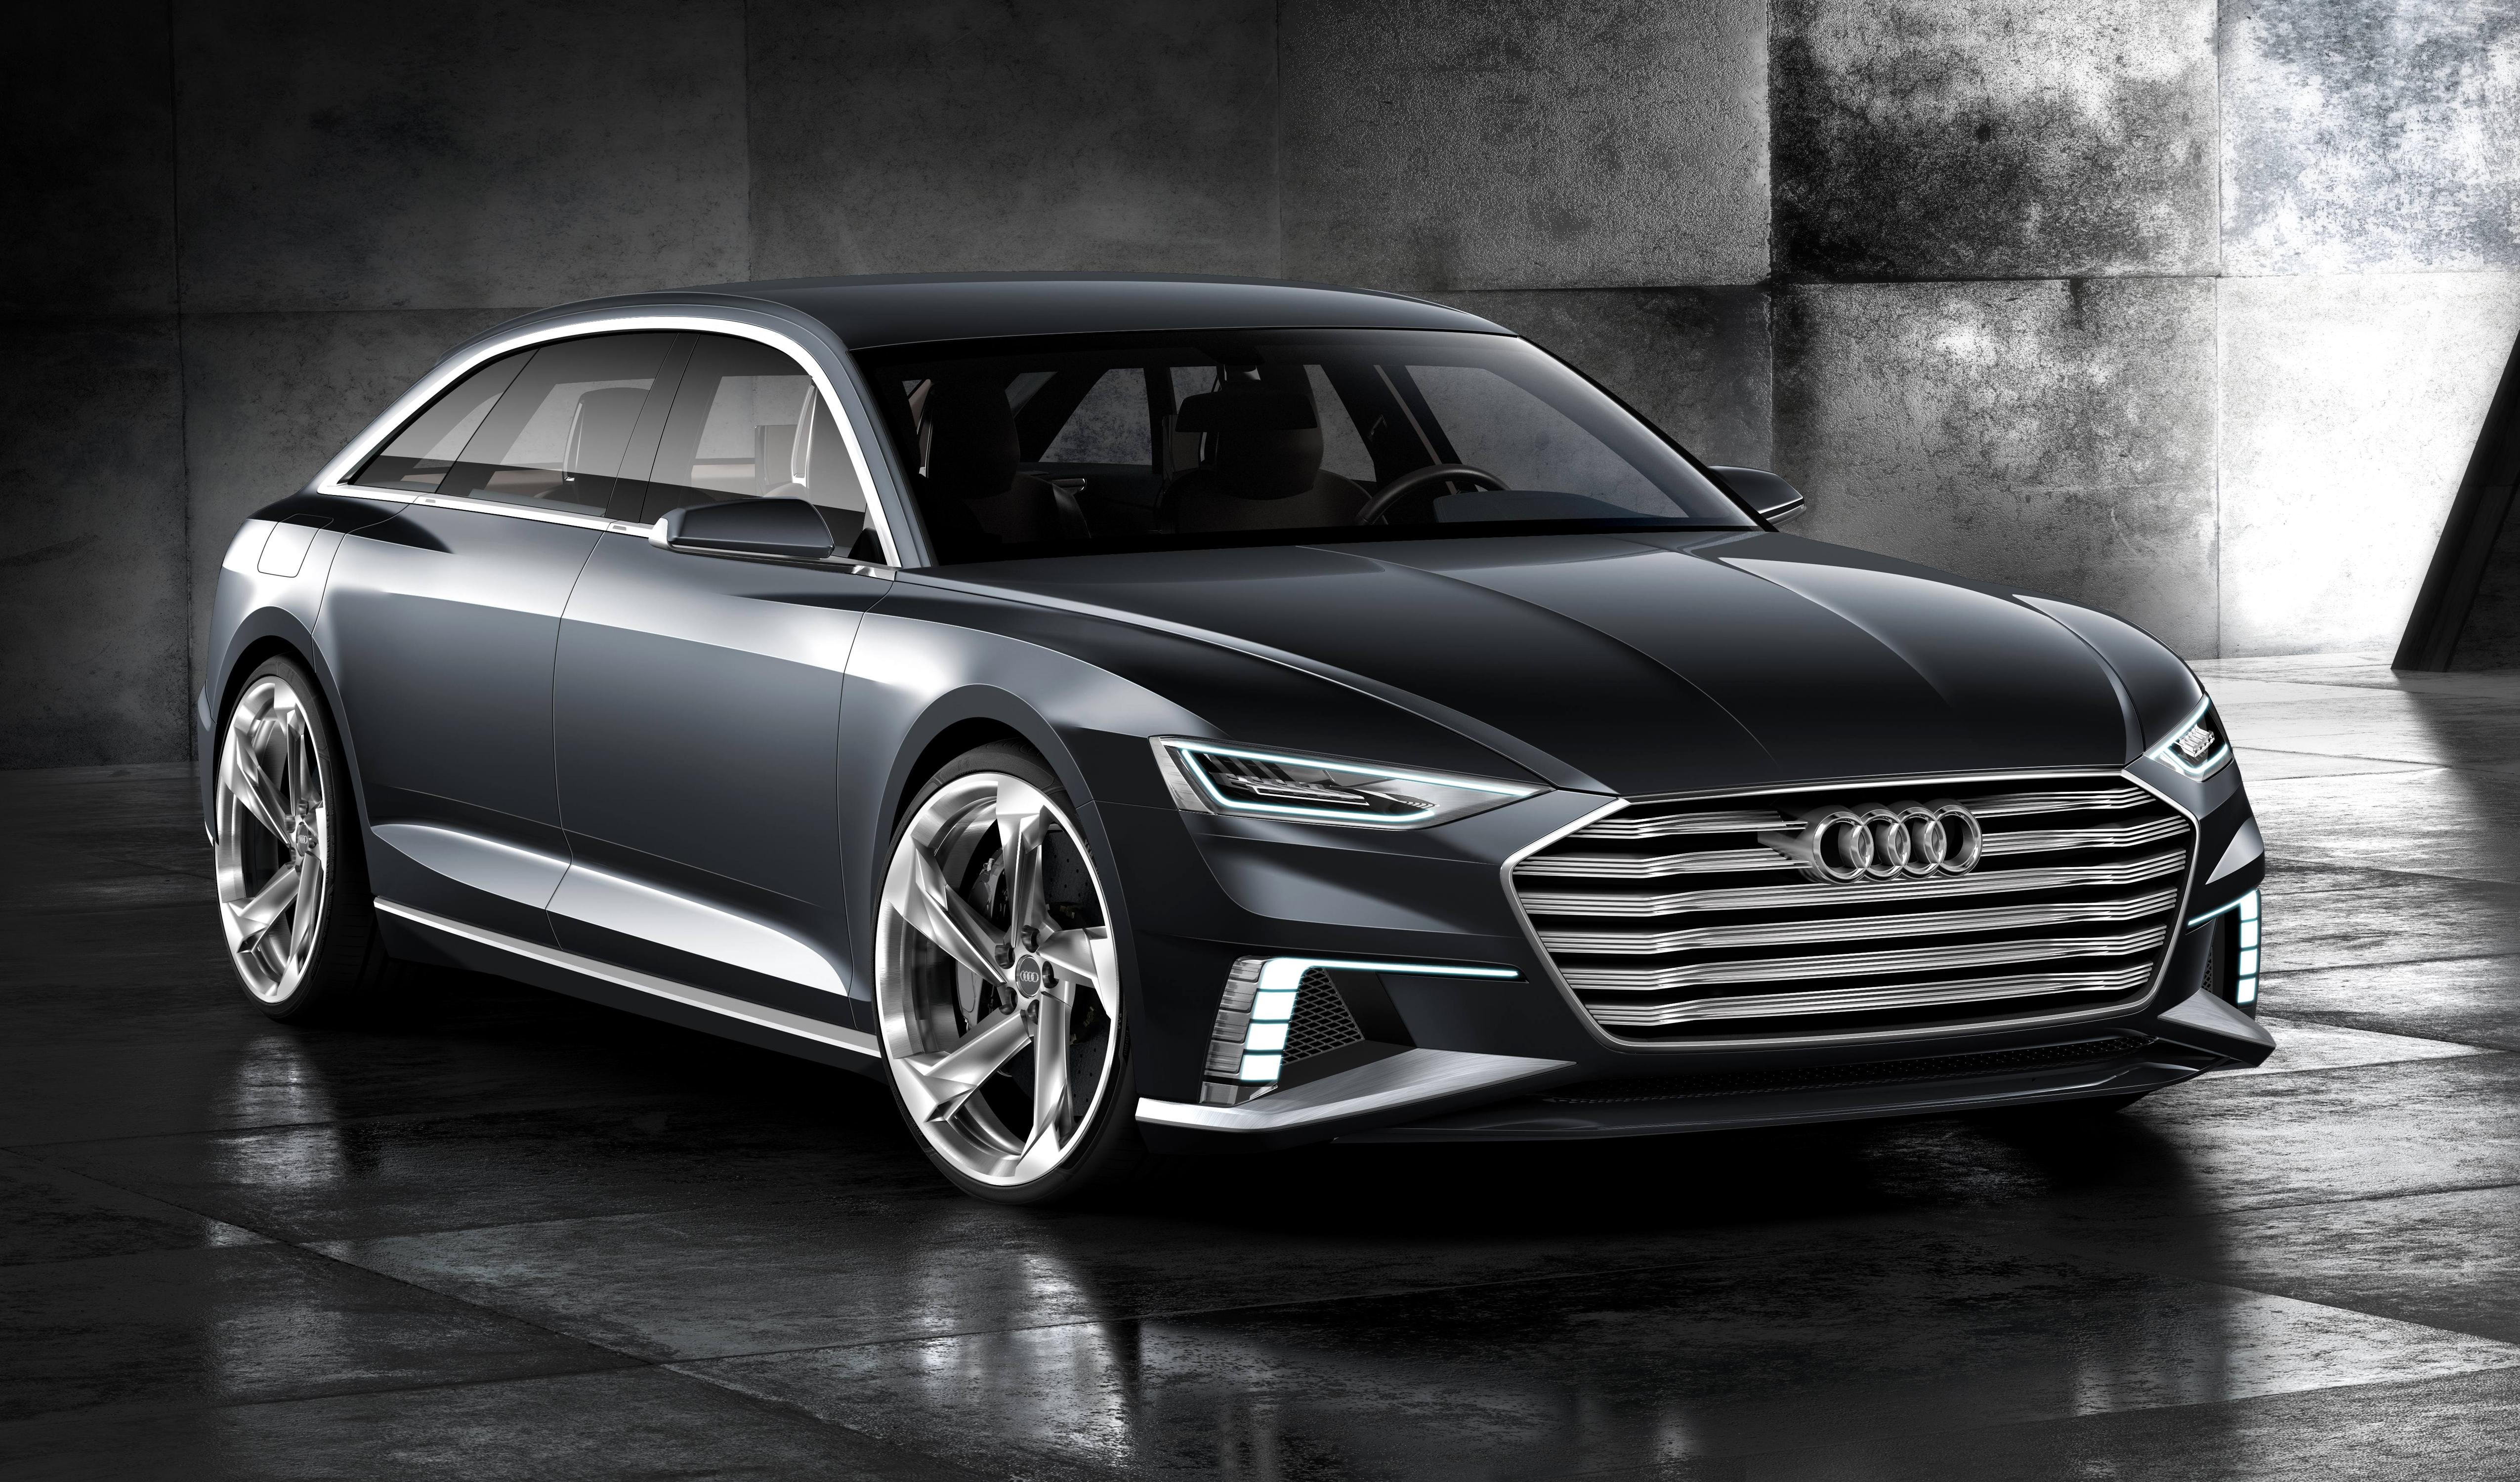 Pictures Of Audi Prologue Avant